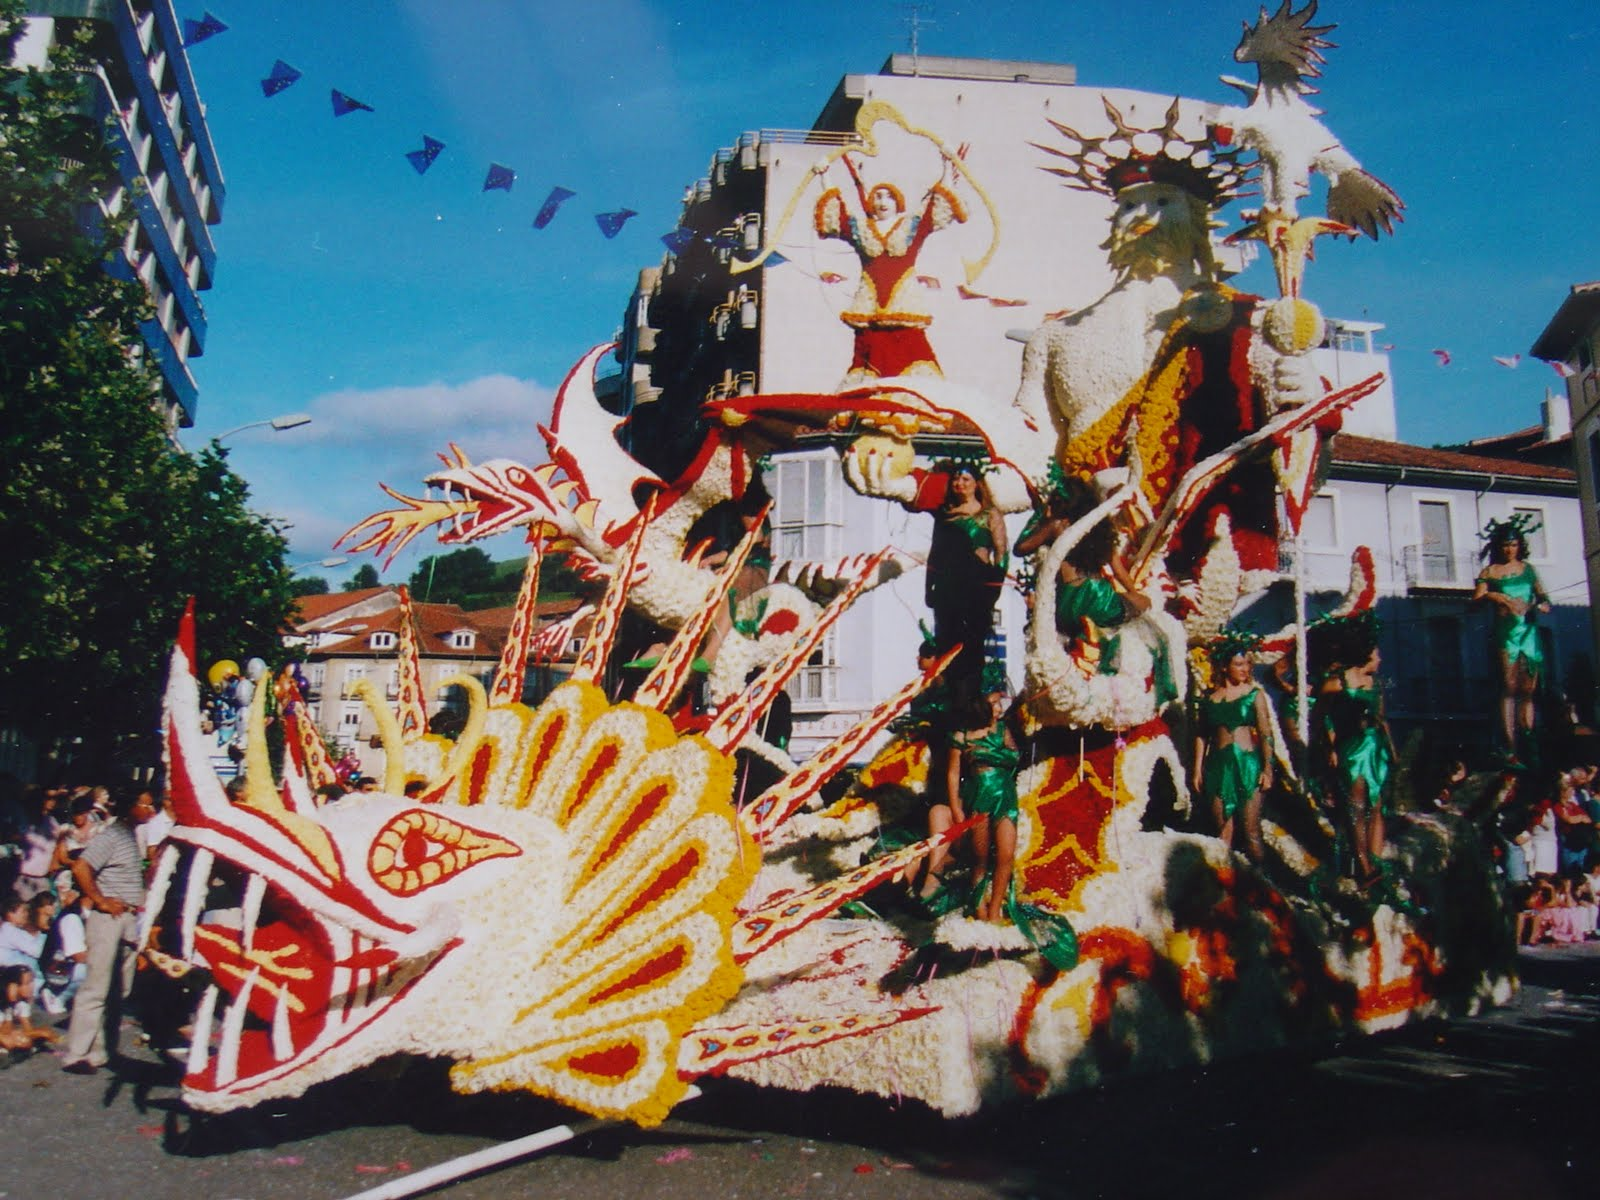 Carrozas oru a a o 1996 titulo carroza jard n prohibido for Jardin prohibido